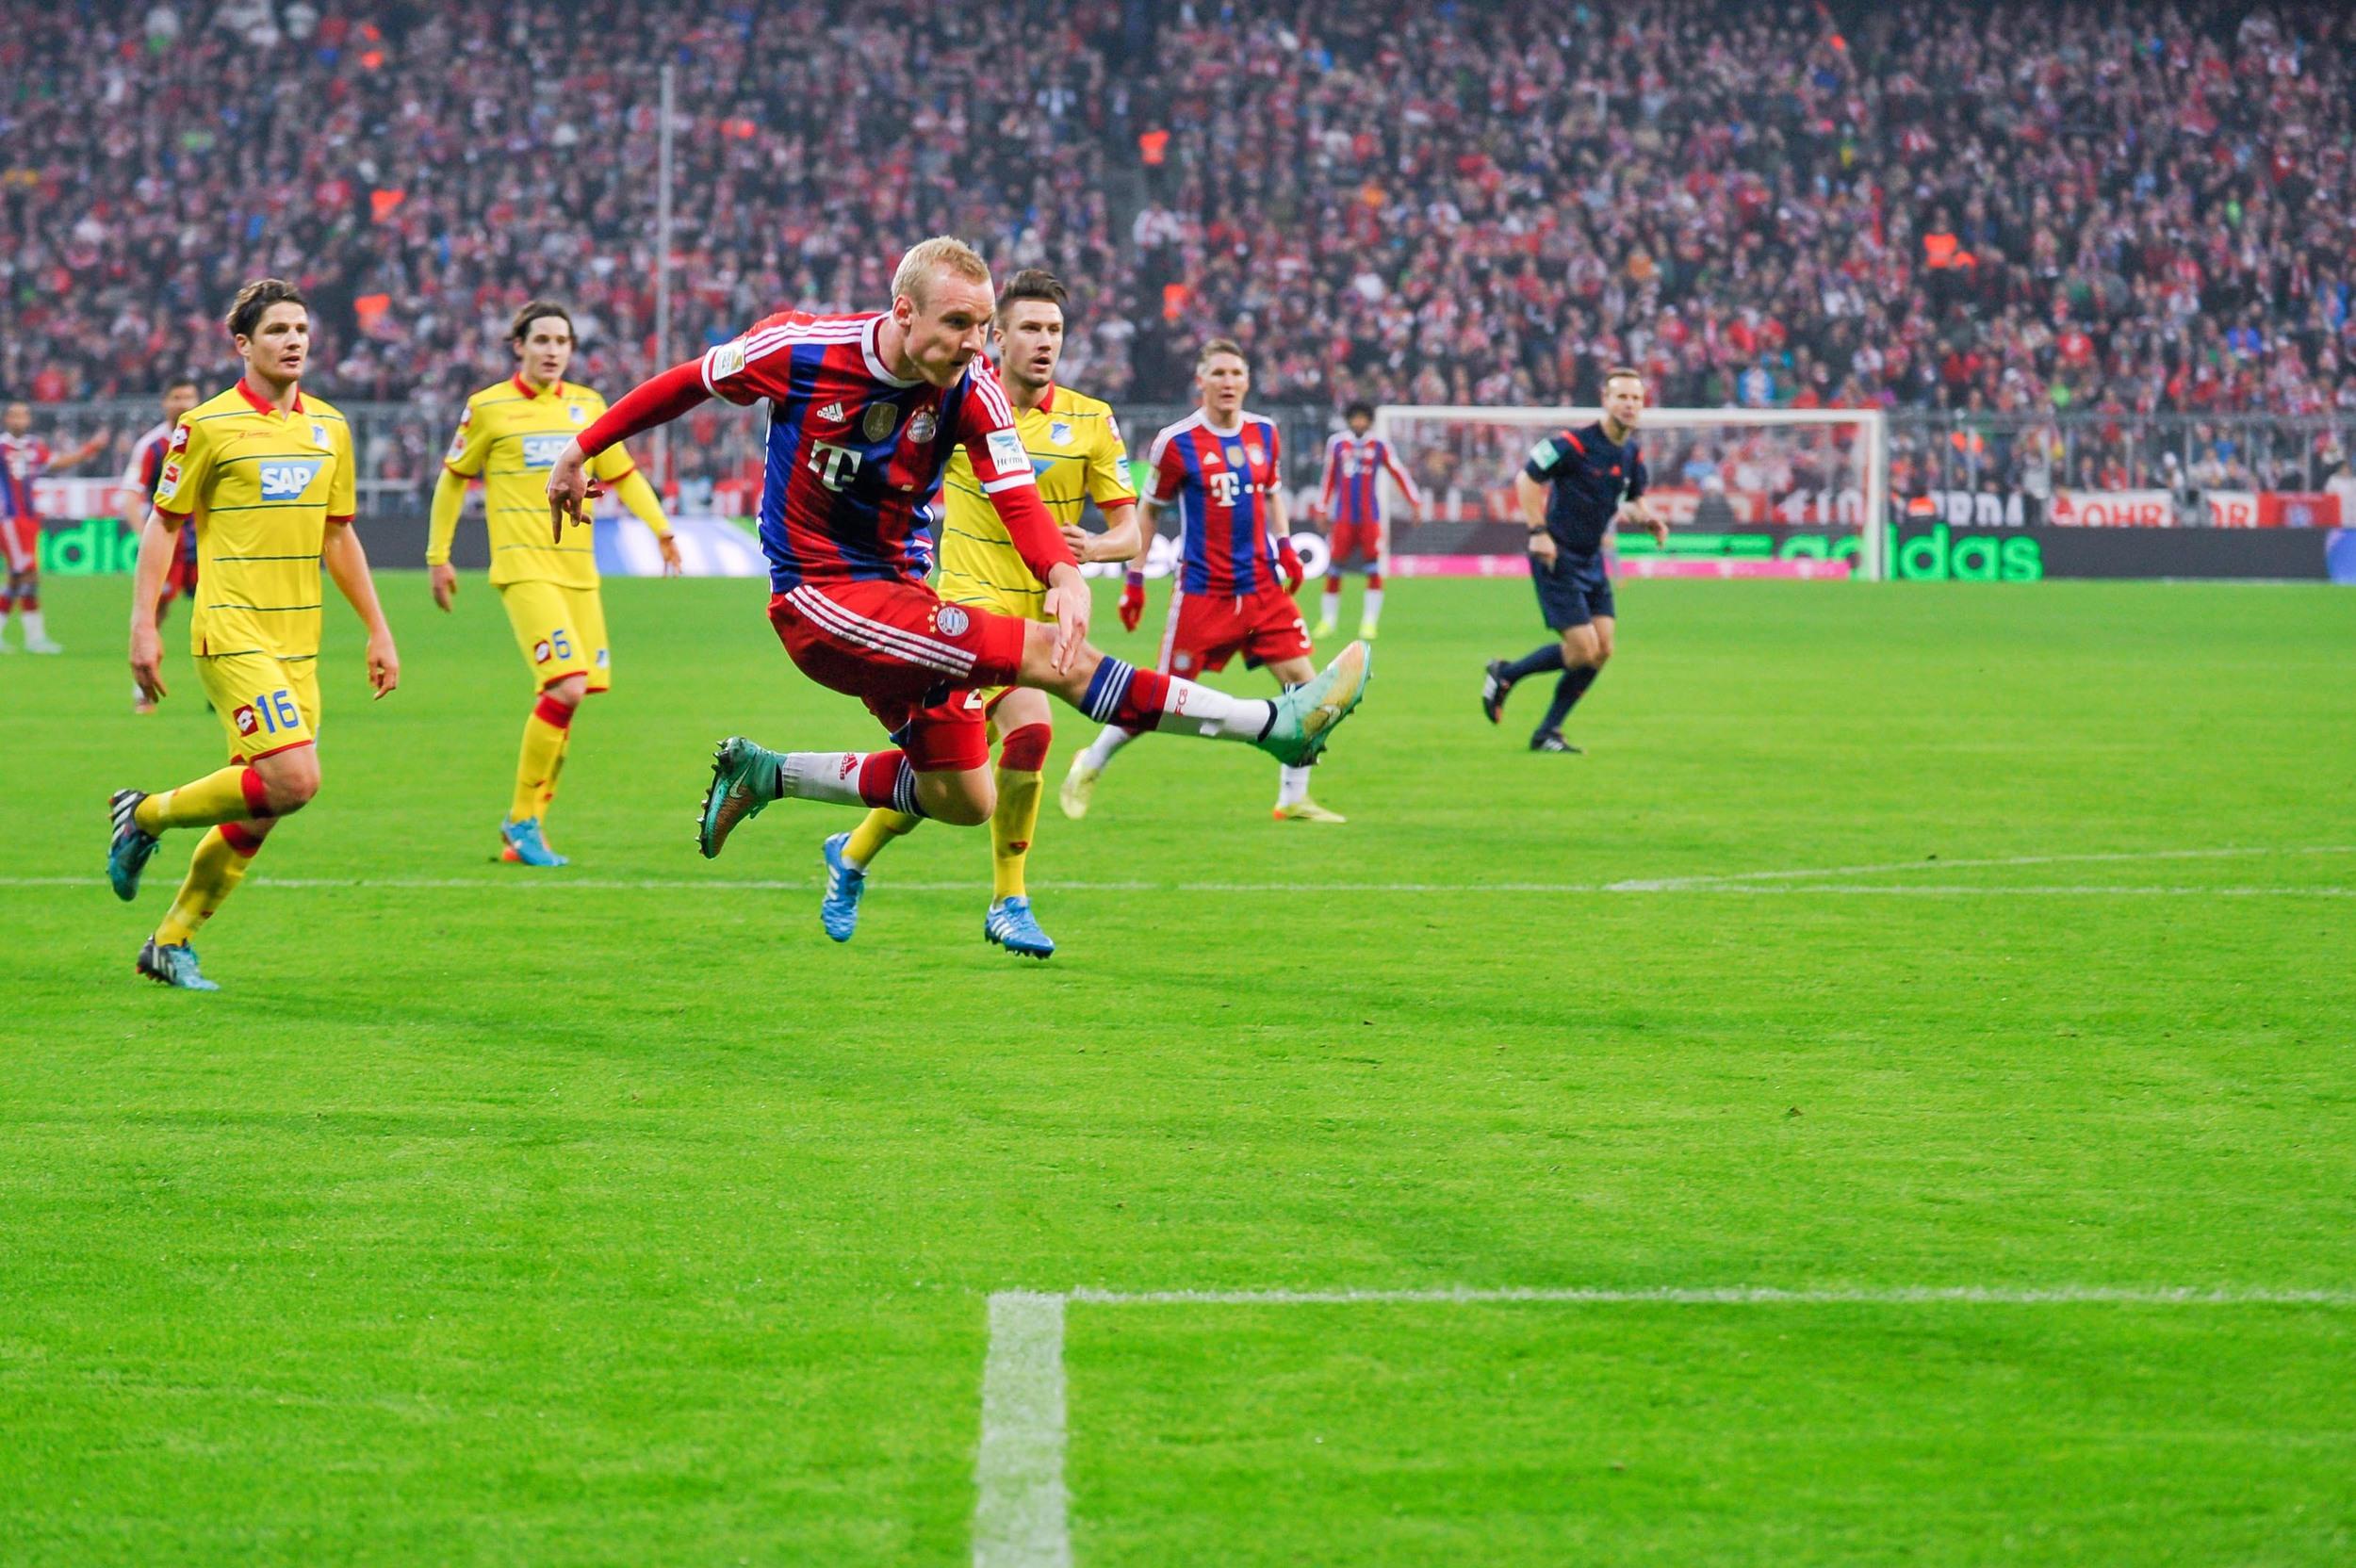 Stadion_FCB_vs_TSGH_22.11.2014_web-38.jpg